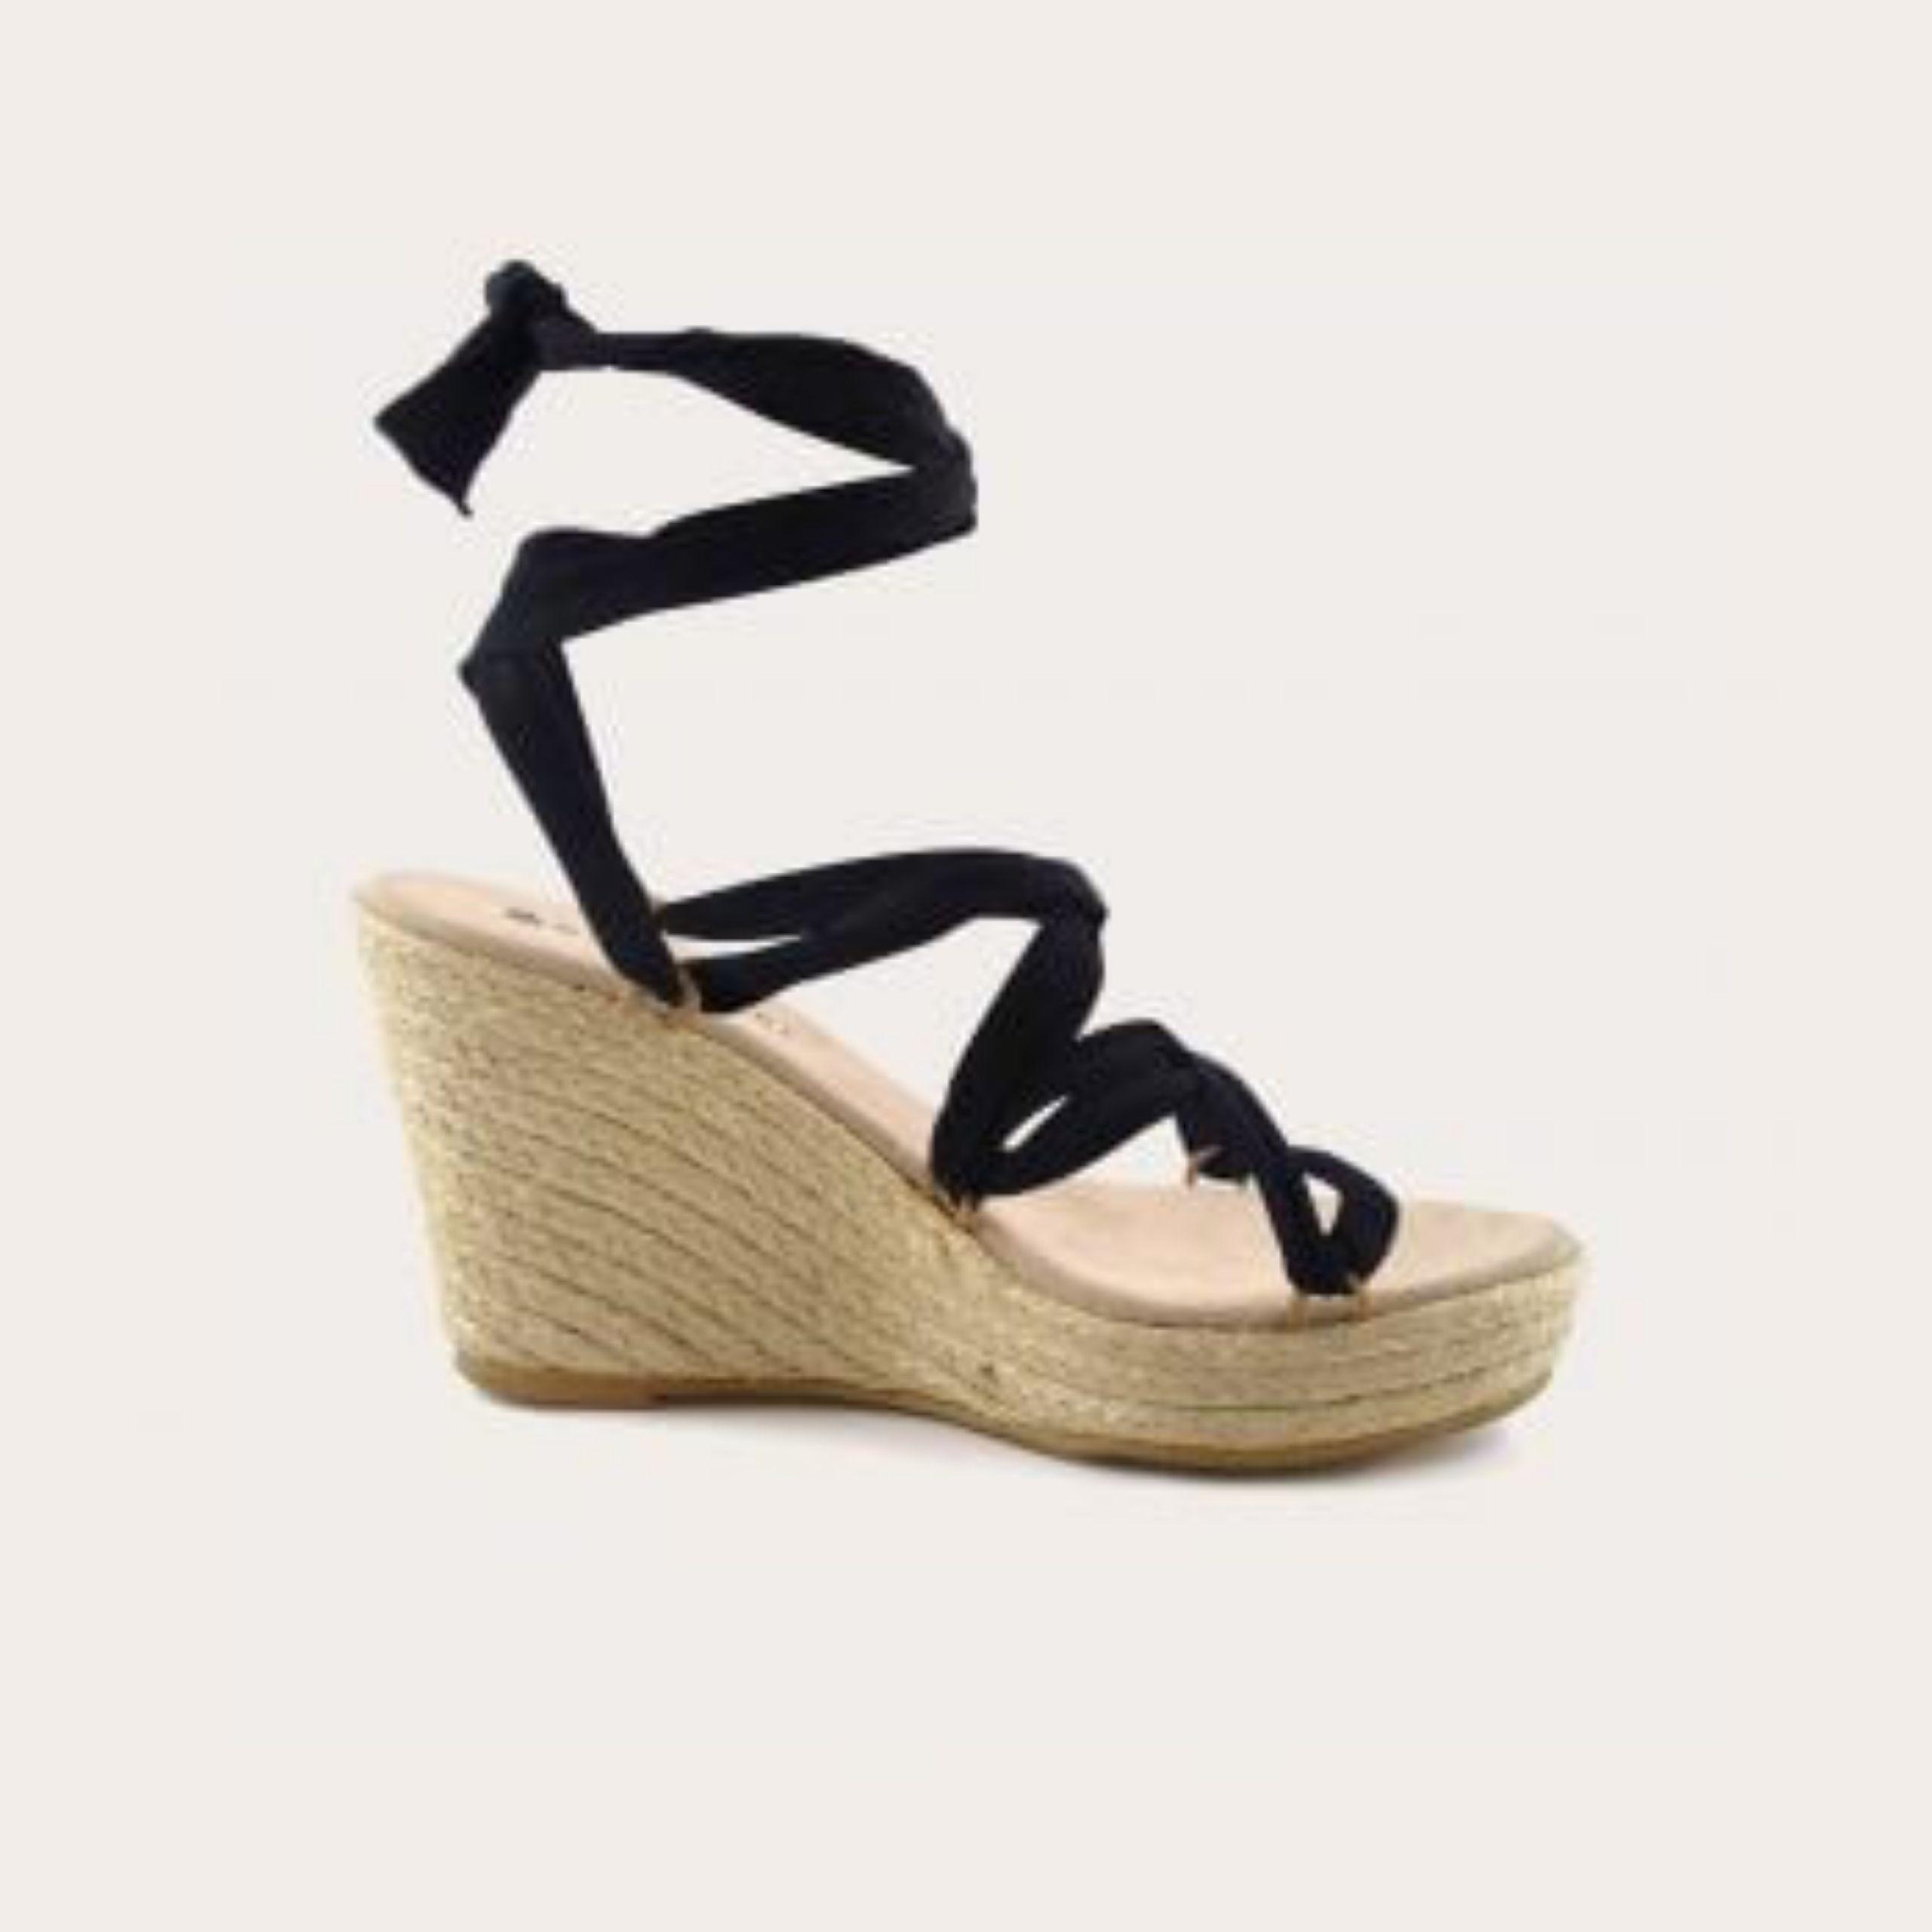 chilon-1_lintsandalen sandals travelsandals vegan sustainable sandals wikkelsandalen